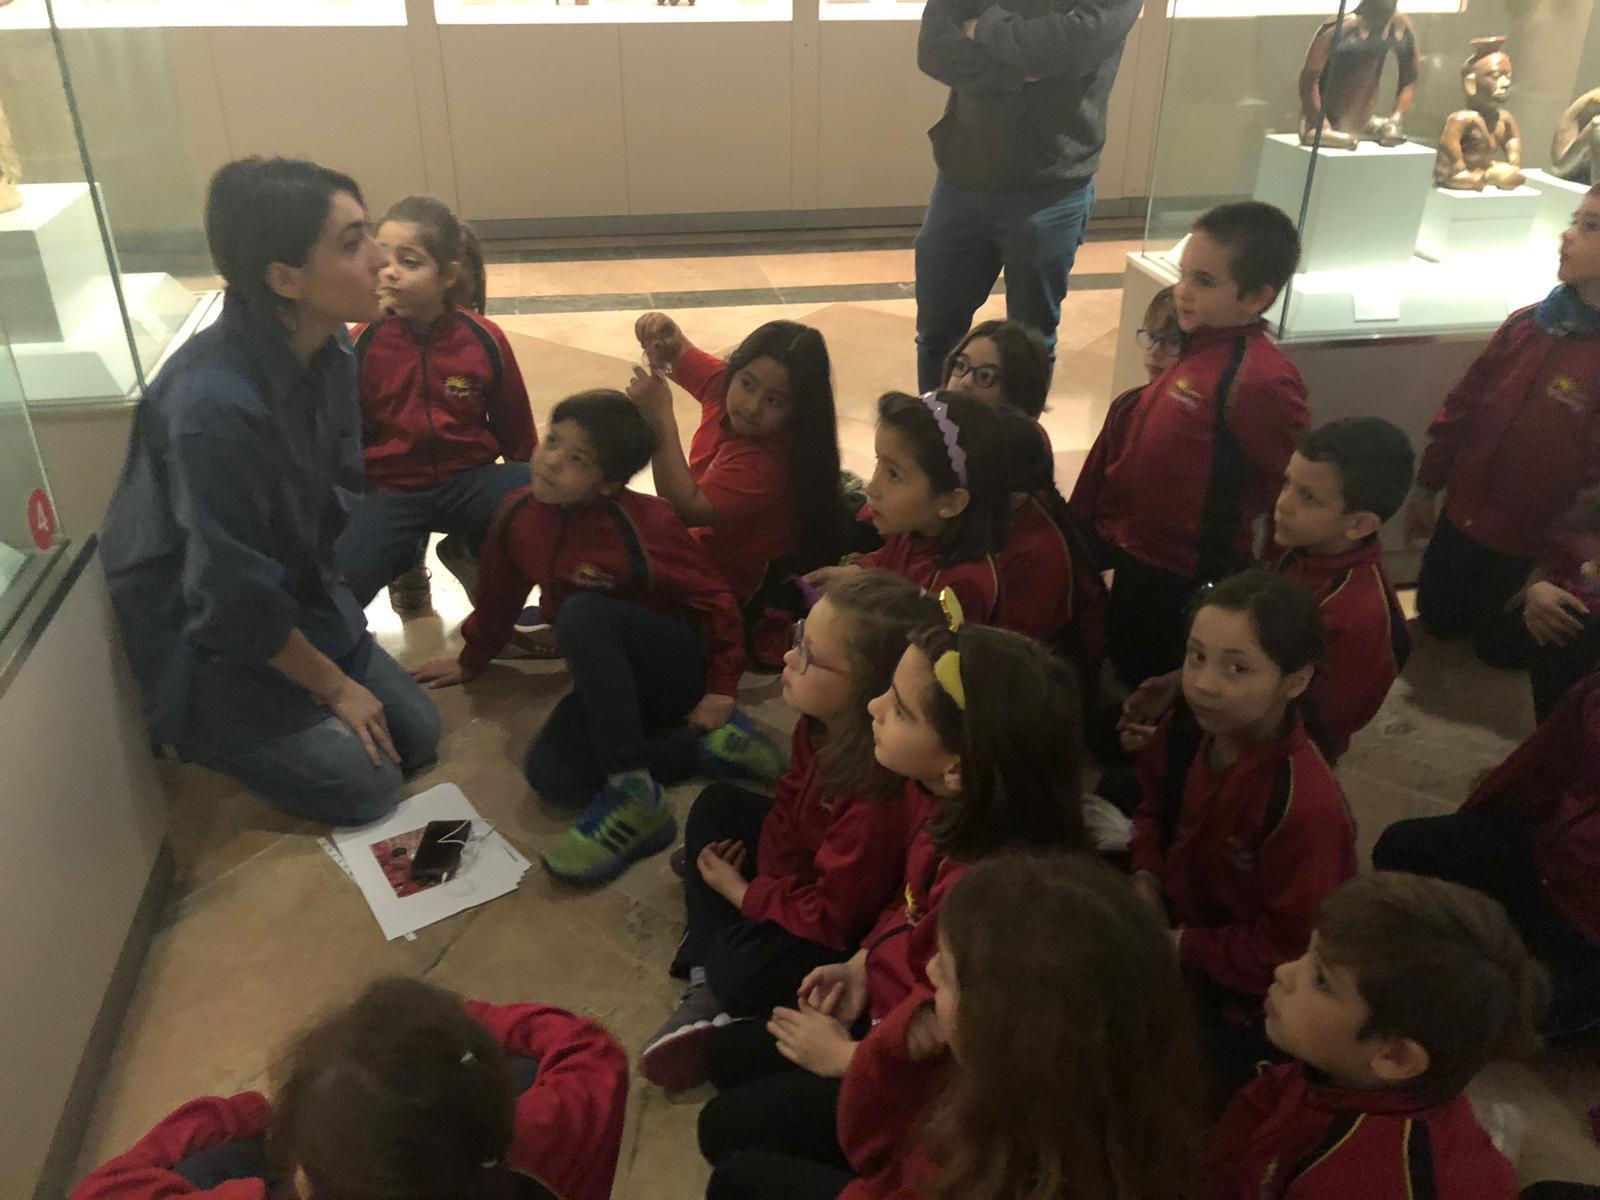 MUSEO DE AMÉRICA, FEBRERO 2019 14